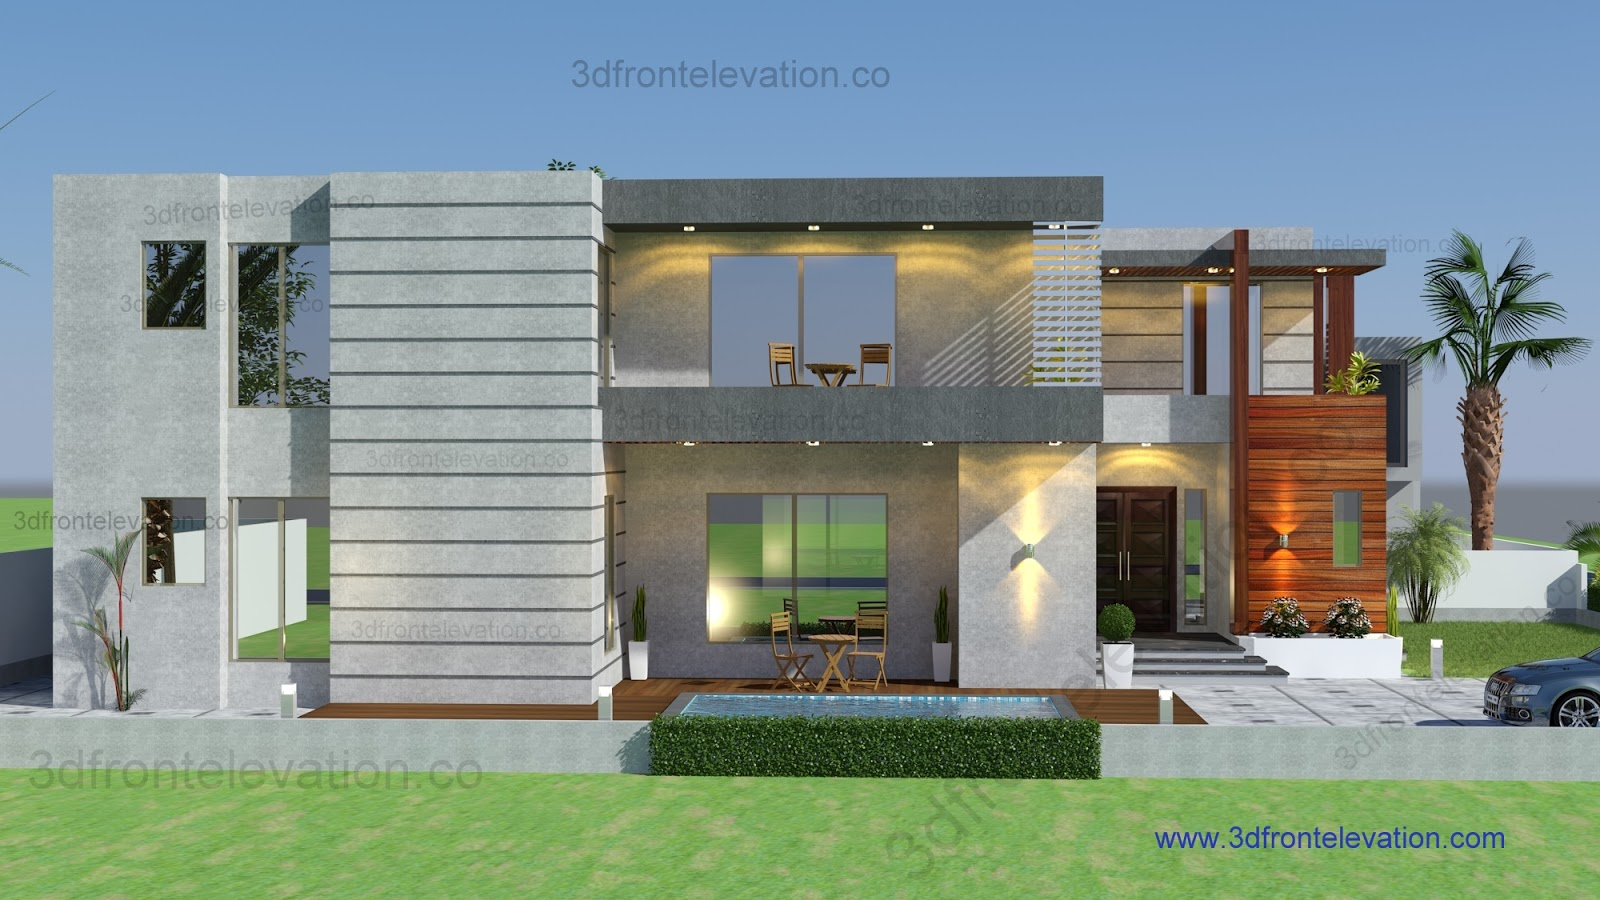 7 Marla House Front Elevation Designs : Front elevation of marla houses joy studio design